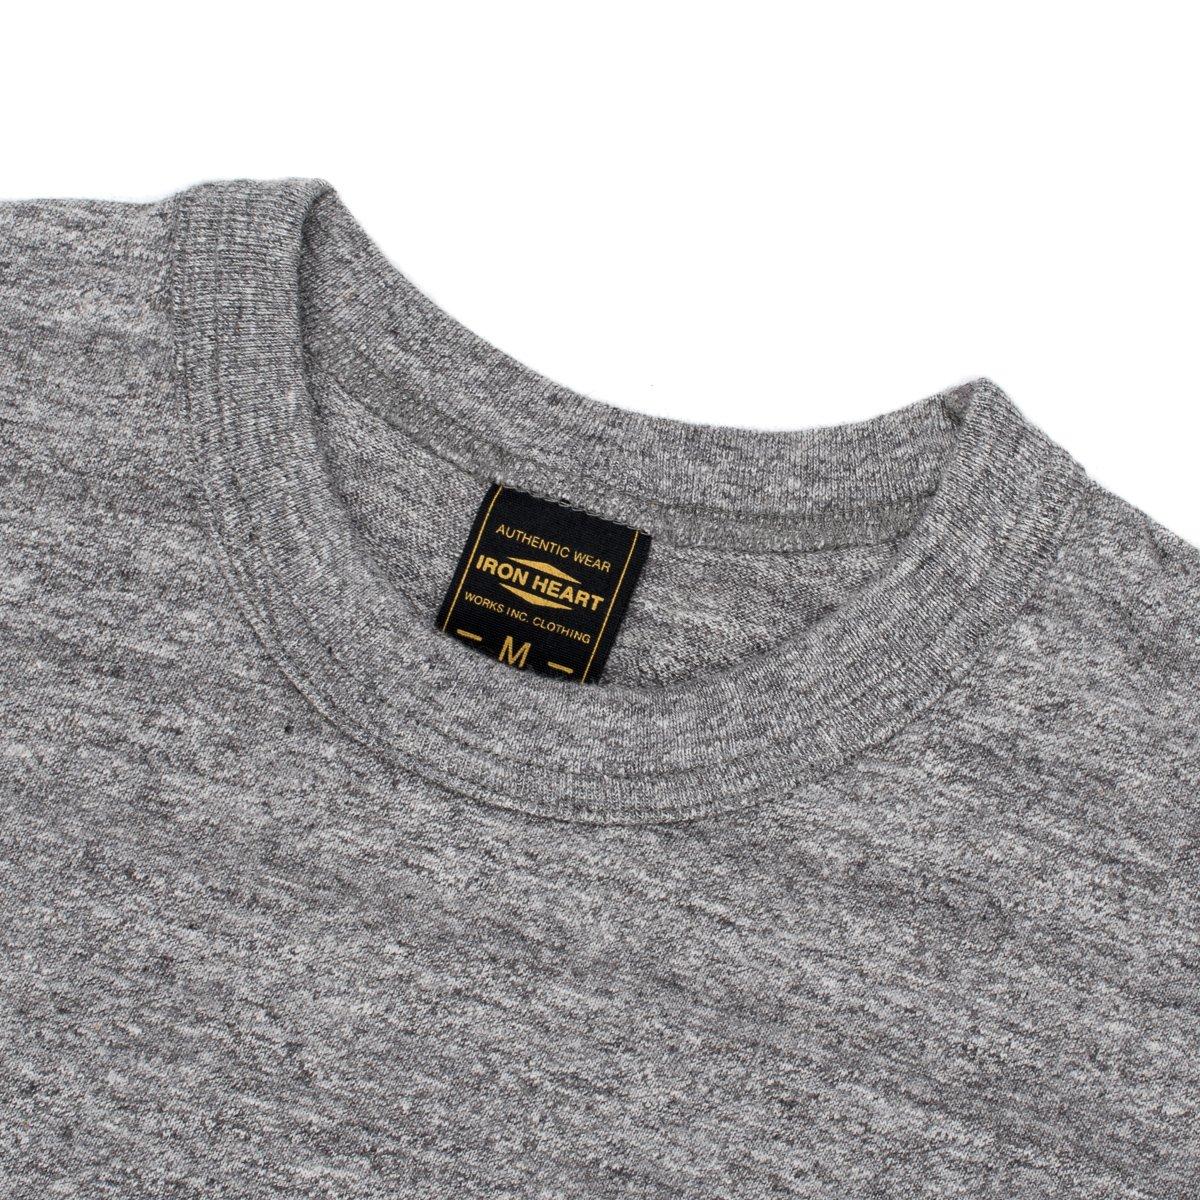 23c0ccdf47 Plain 6.5oz Loopwheel T-Shirts